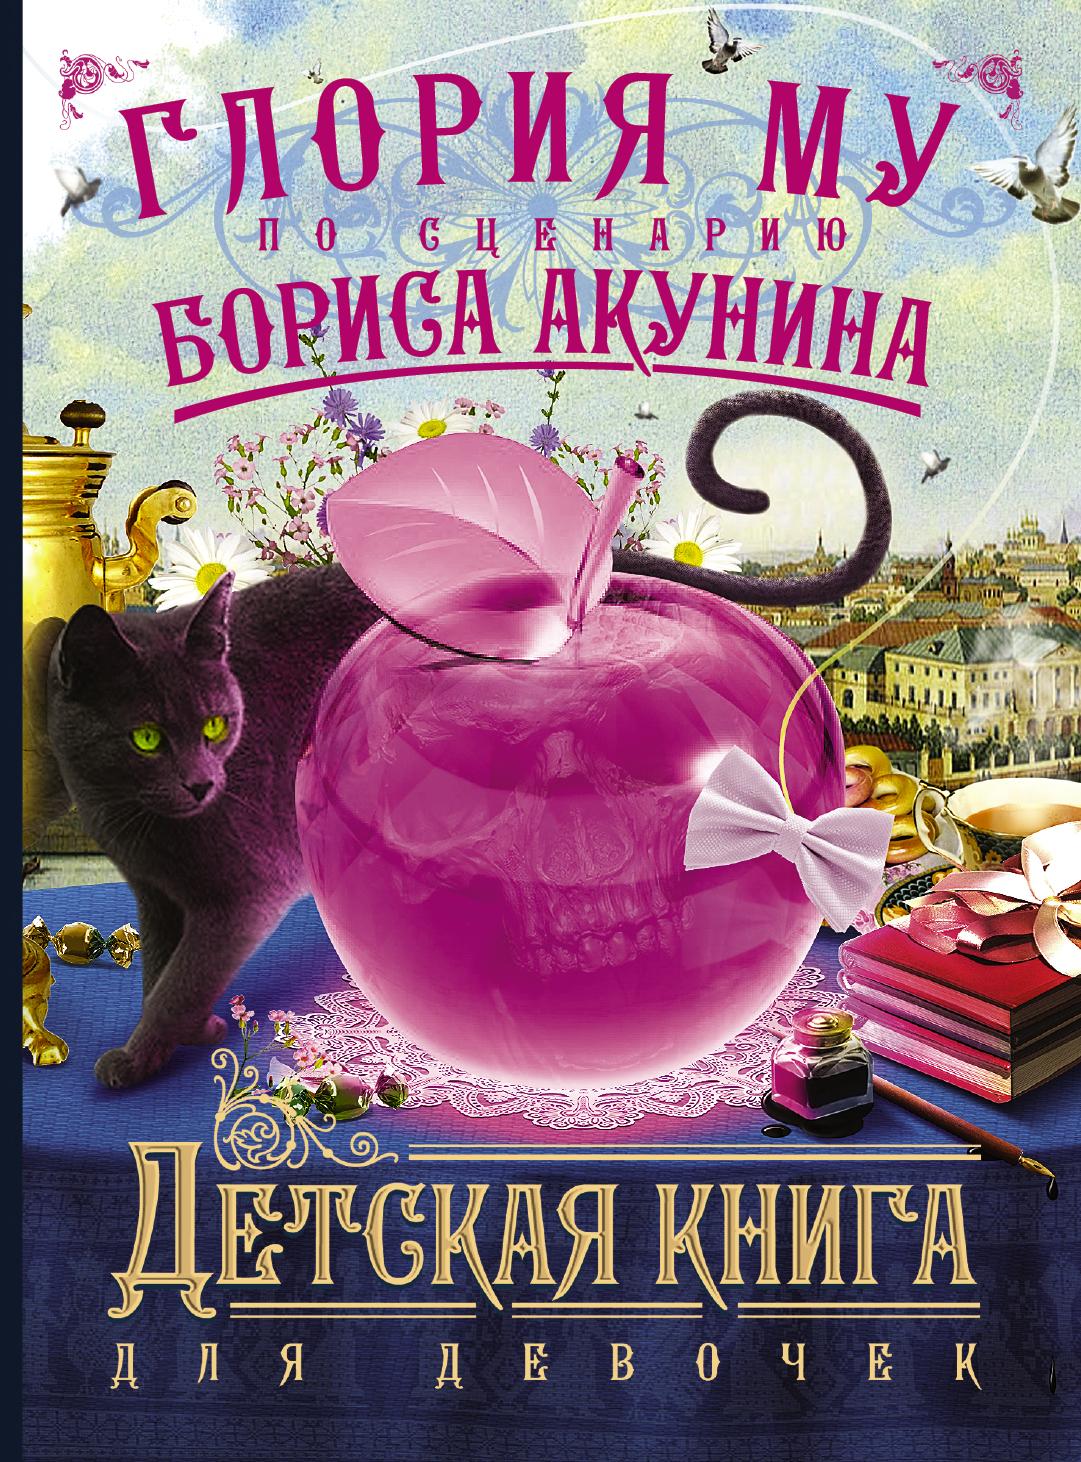 Борис Акунин Детская книга для девочек борис акунин детская книга для девочек